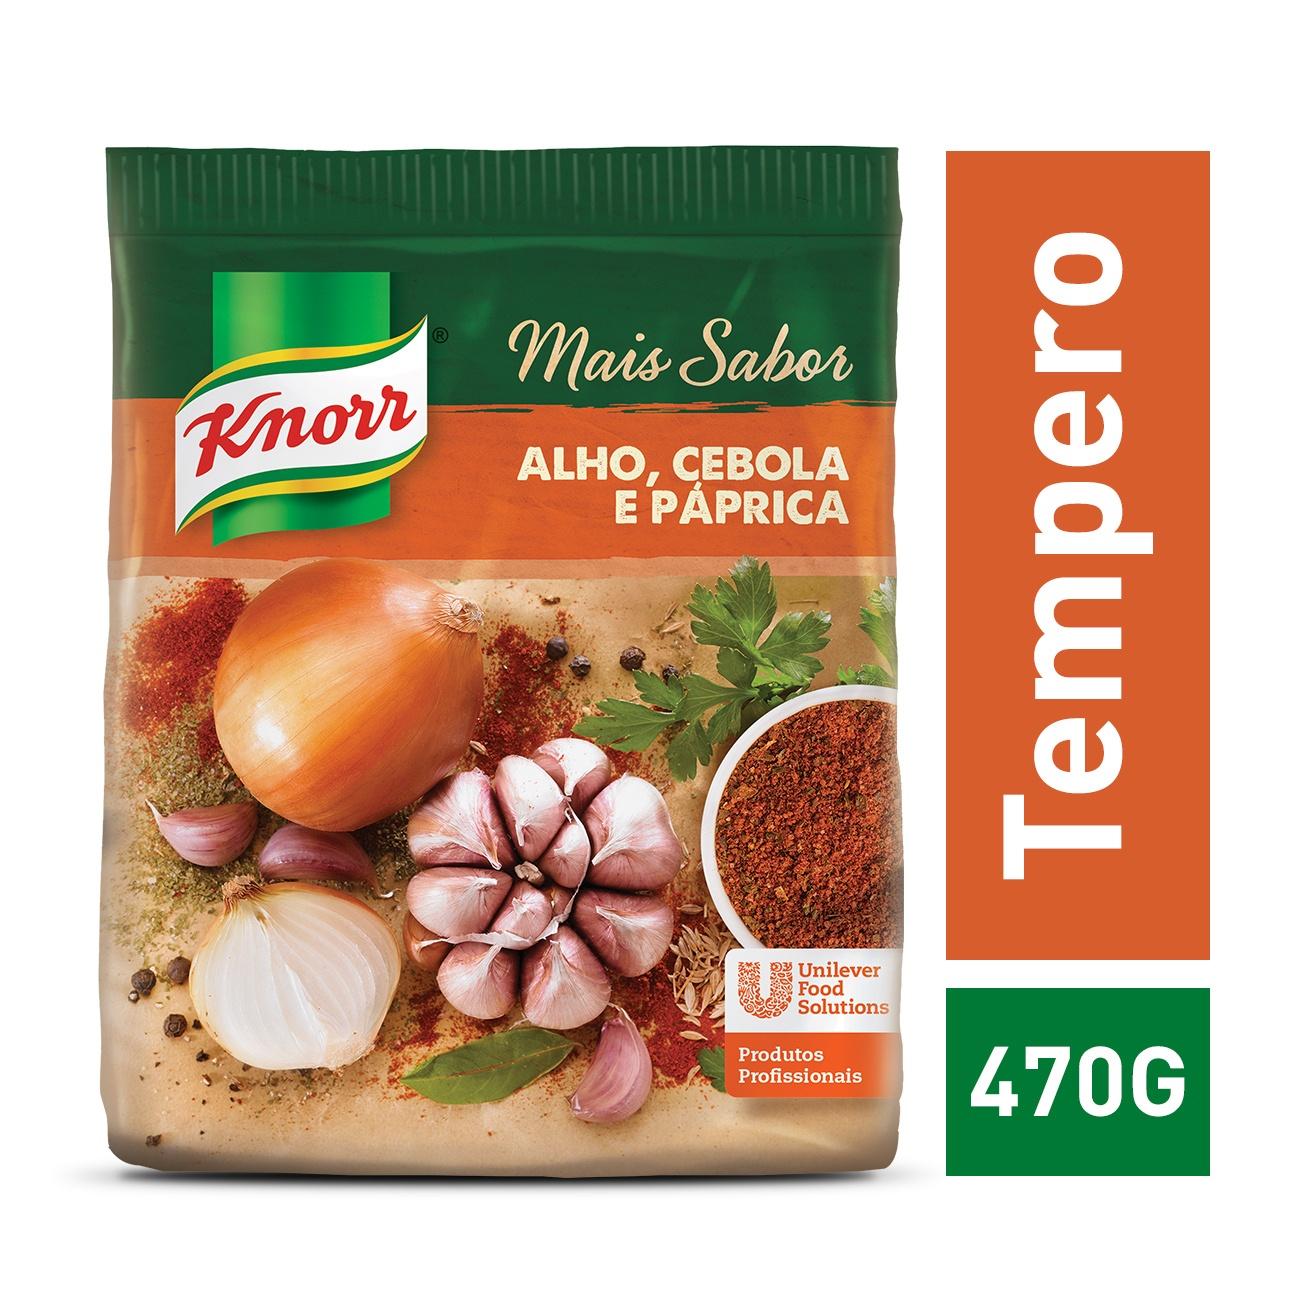 Tempero Knorr Mais Sabor P�prica 470g